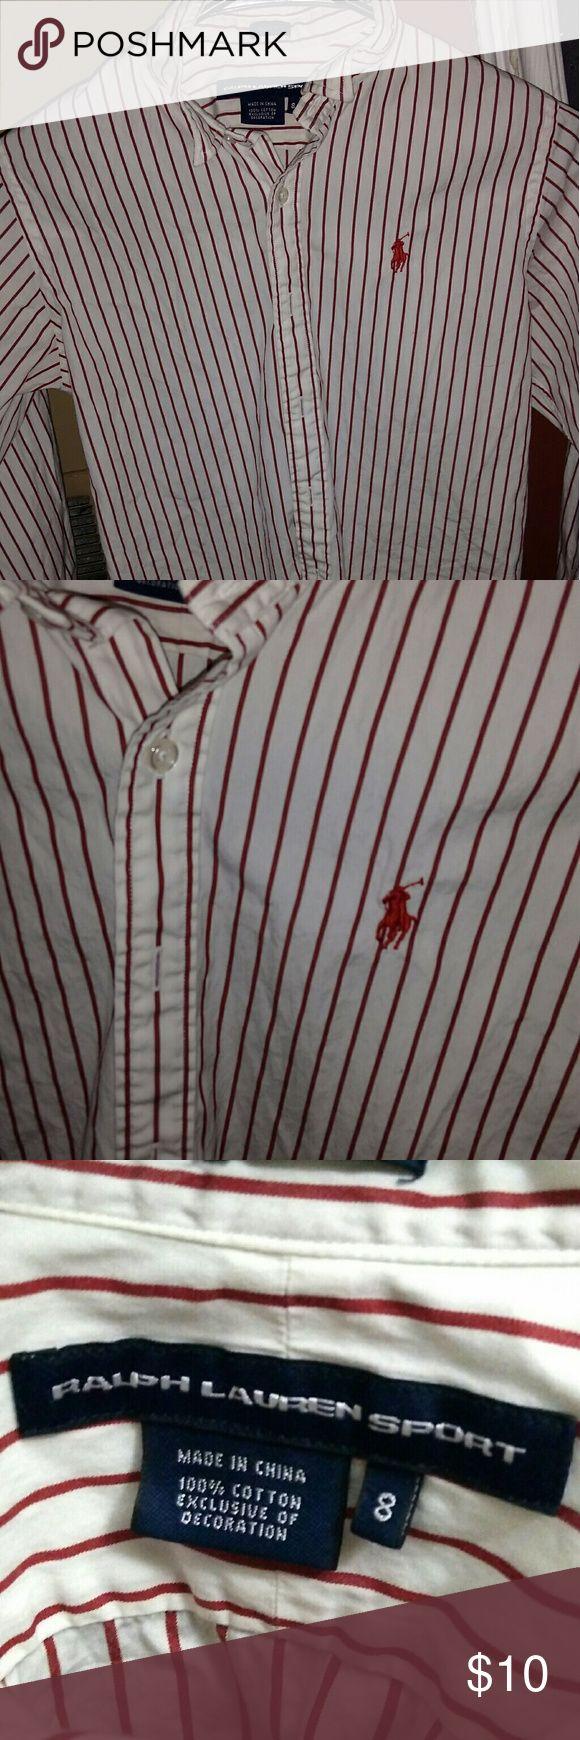 Women Ralph Lauren button up White with Red Pin Stripes Ralph Lauren Tops Button Down Shirts